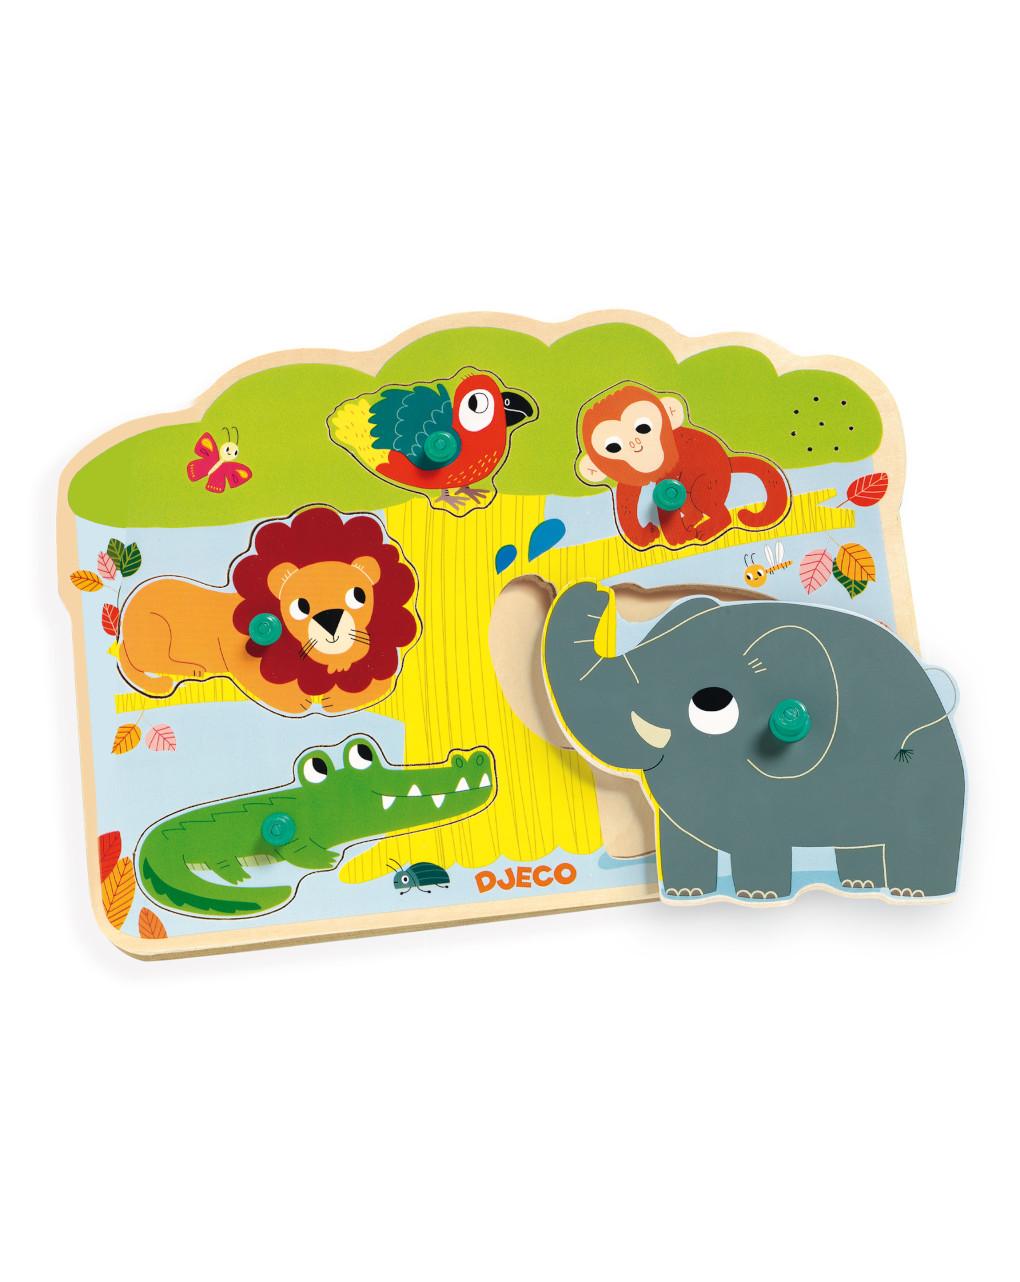 Djeco - baobab - puzzle legno - Djeco